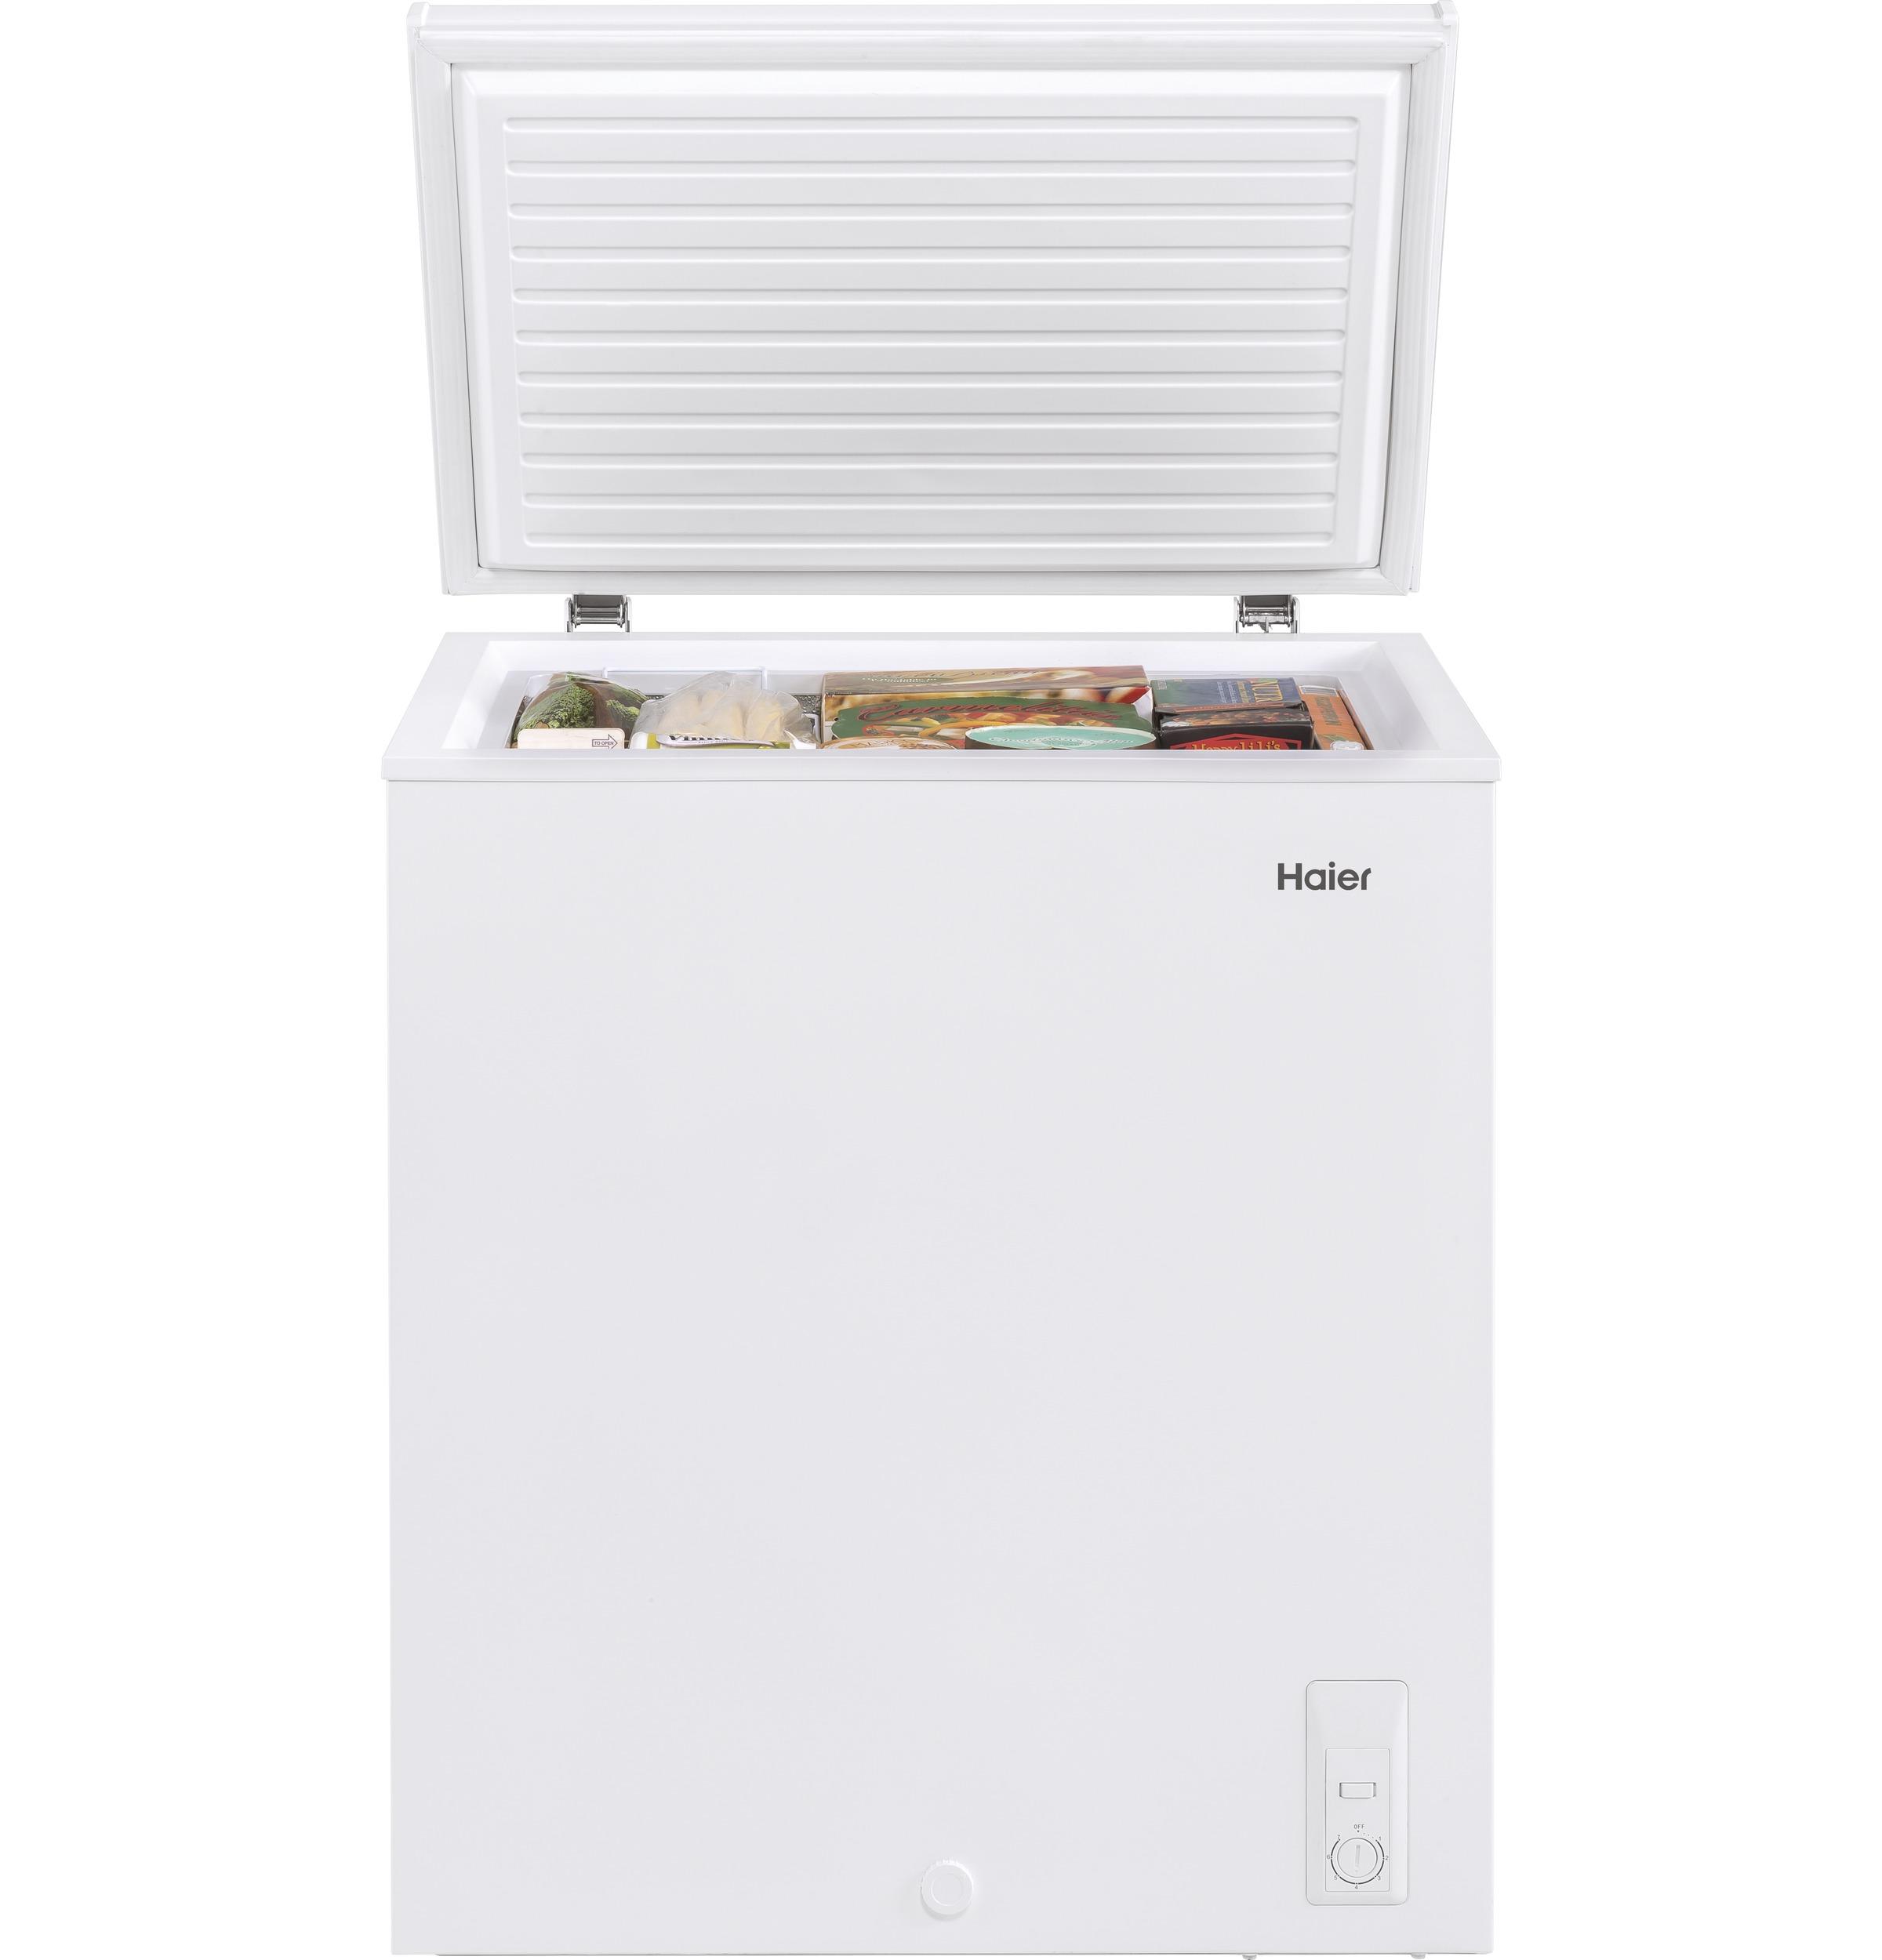 Model: HF50CW20W | Haier 5.0 Cu. Ft. Capacity Chest Freezer